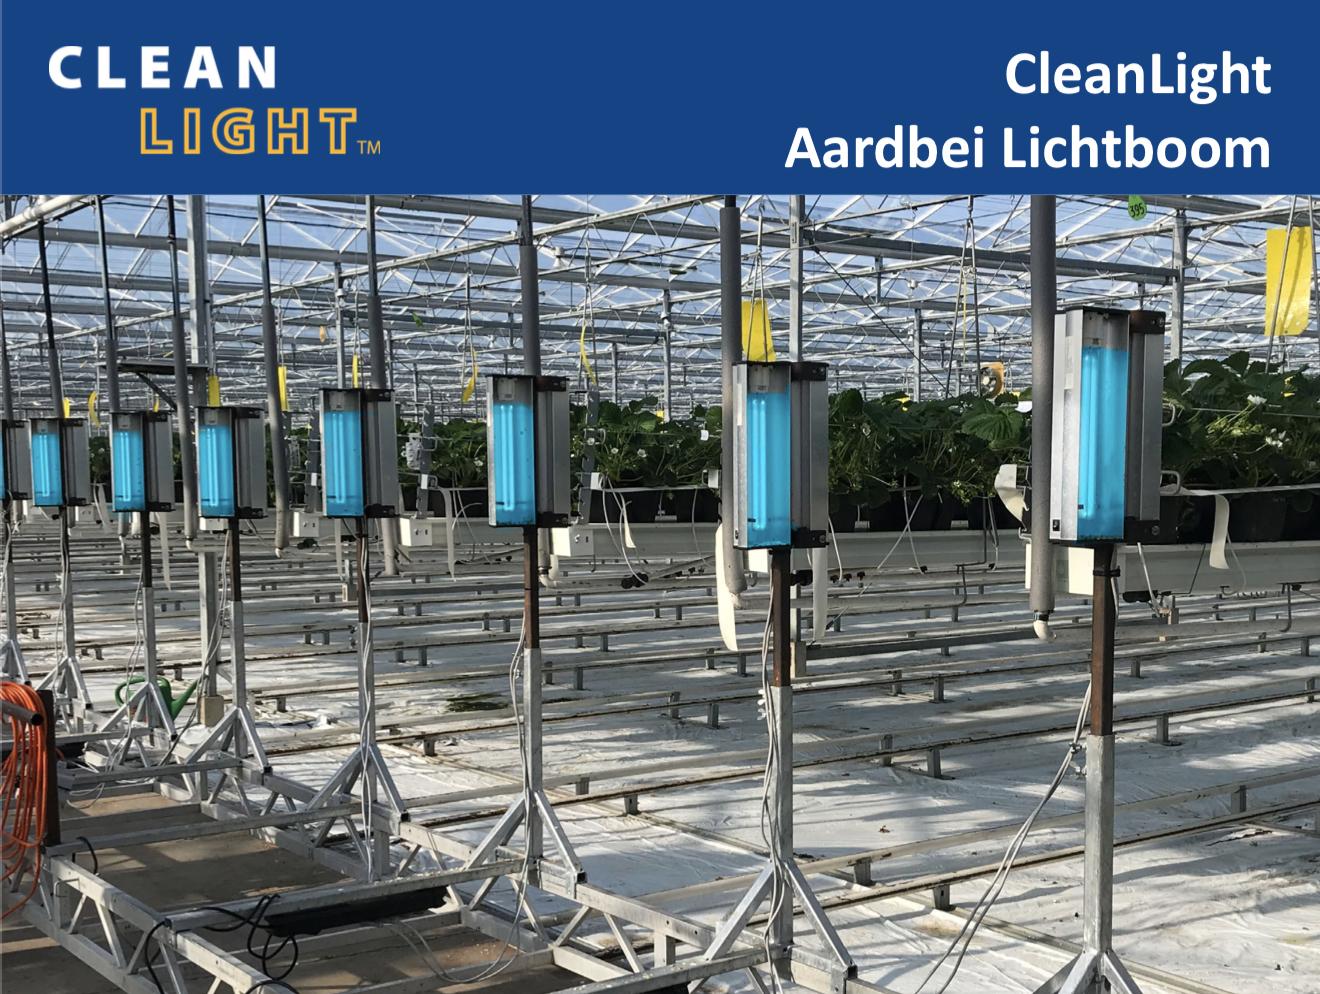 CleanLight Aardbei Lichtboom